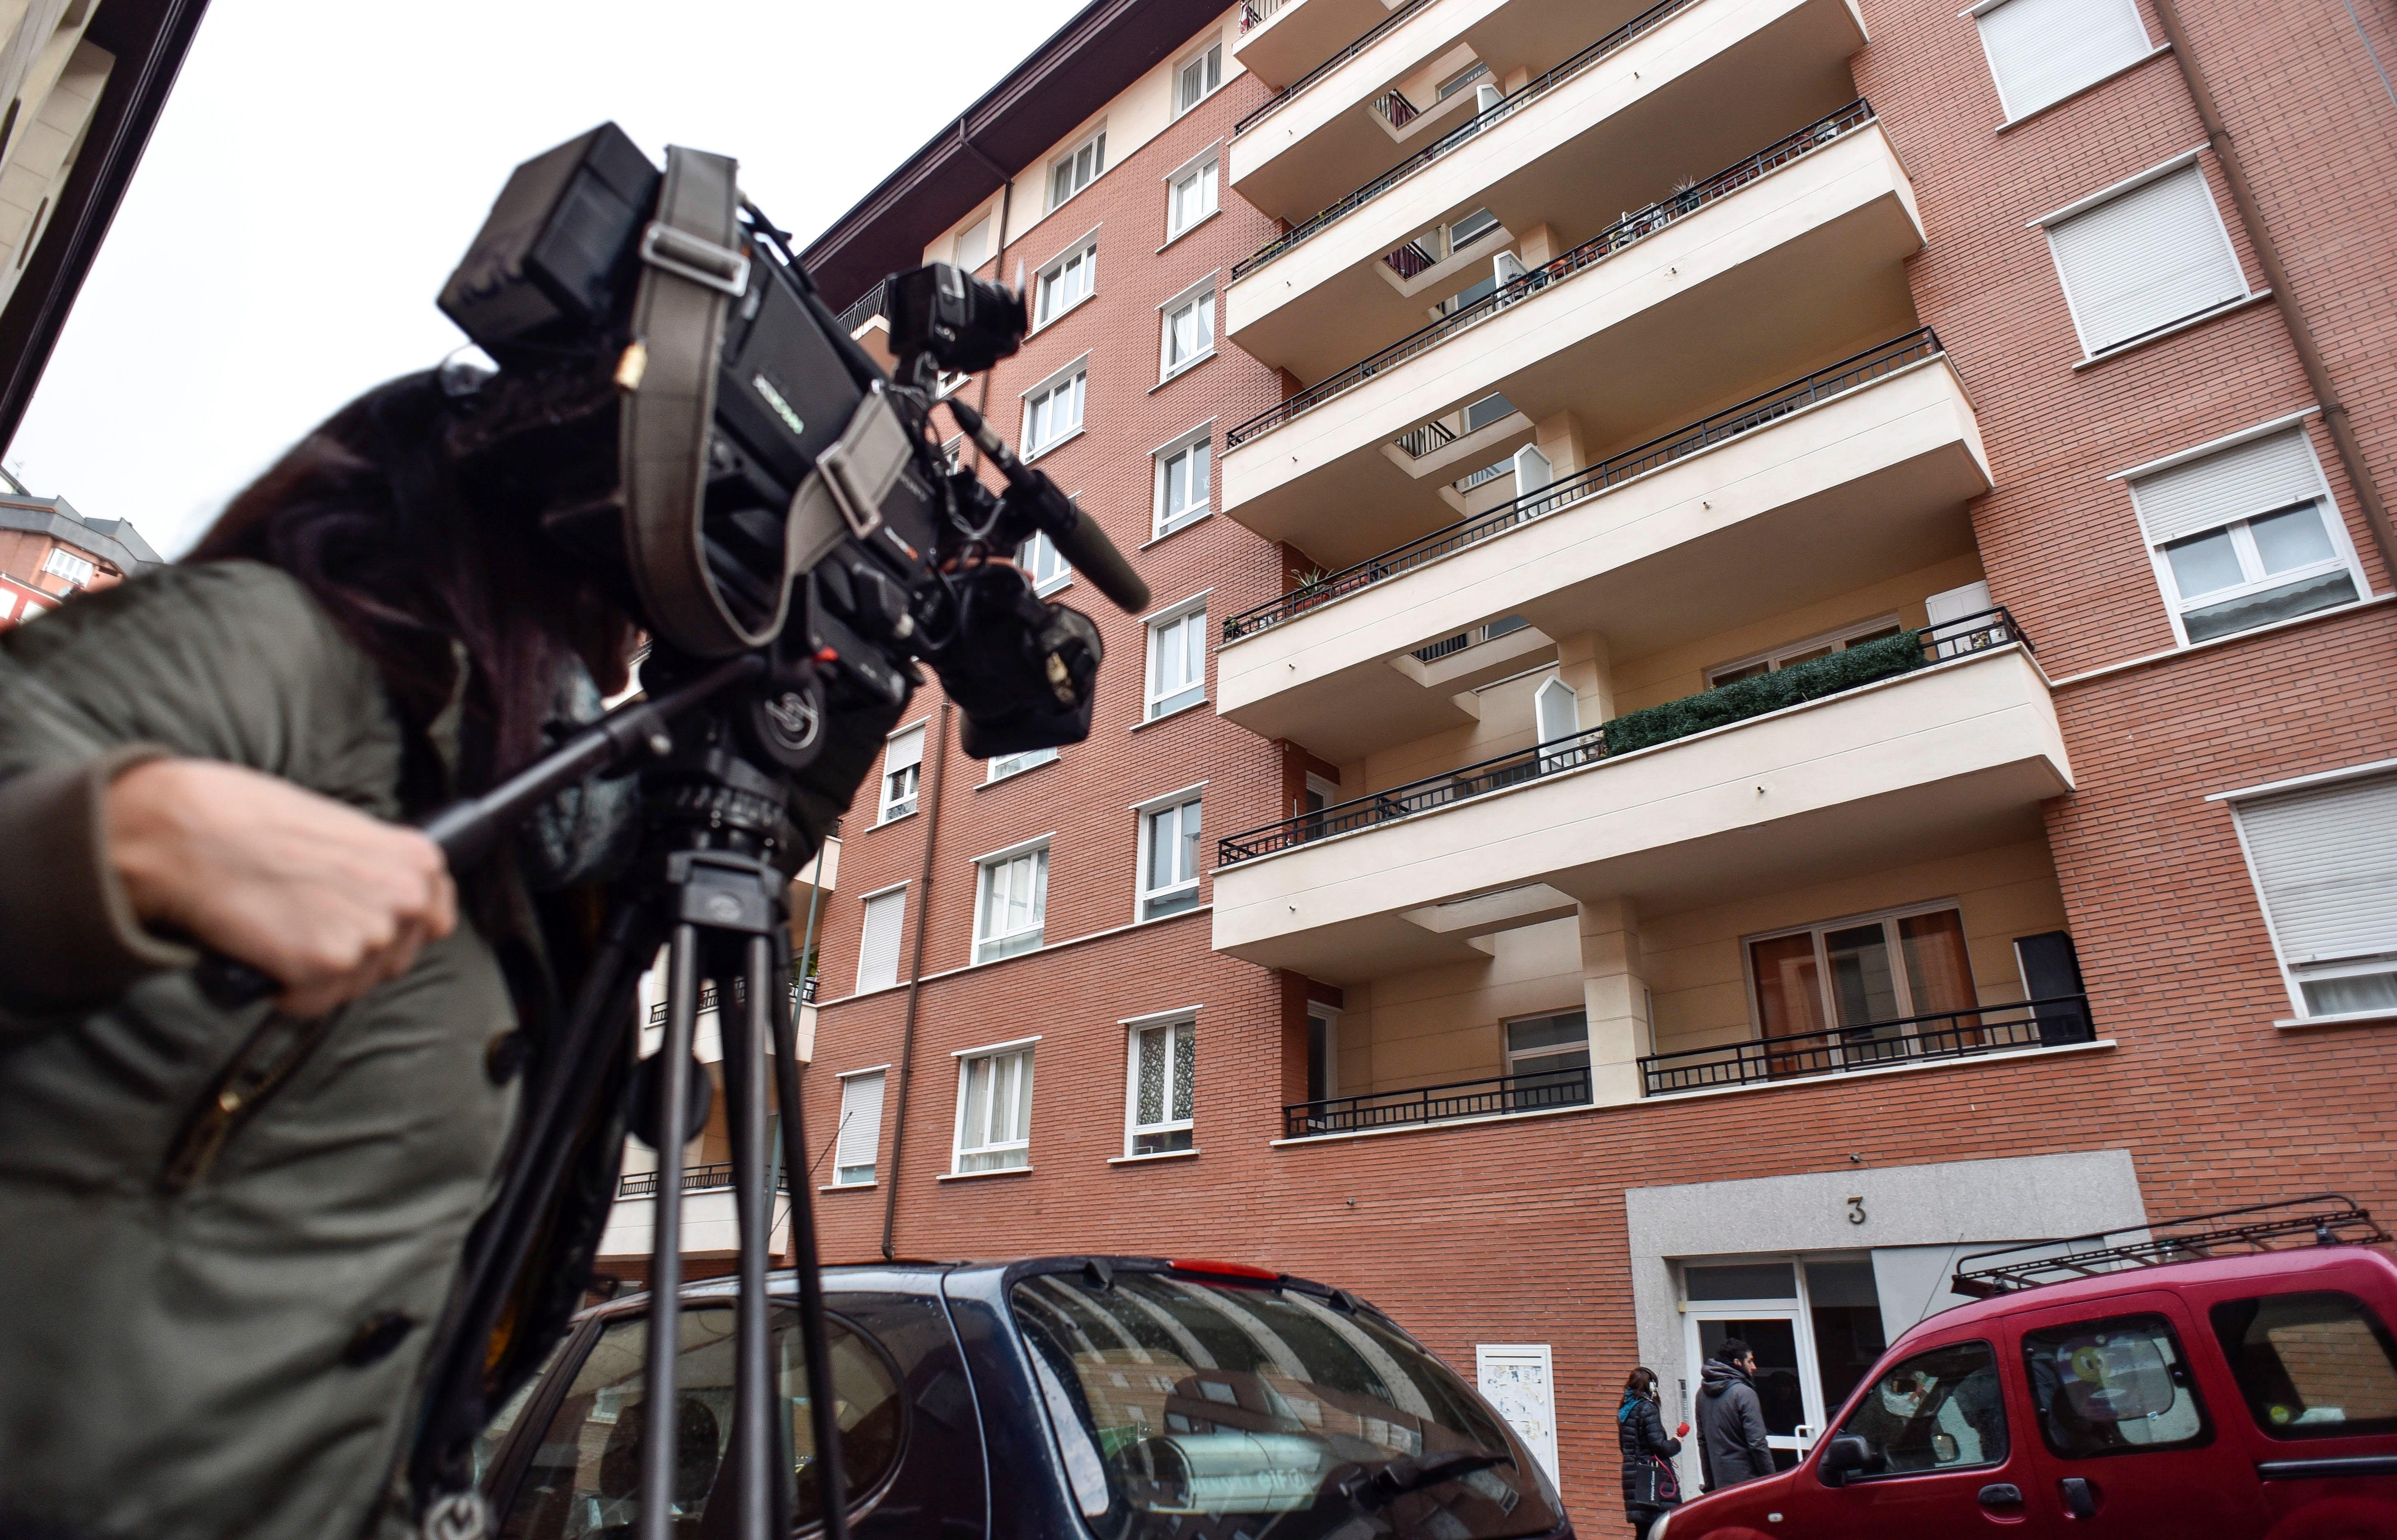 nena morta Bilbao gener 2019 Efe